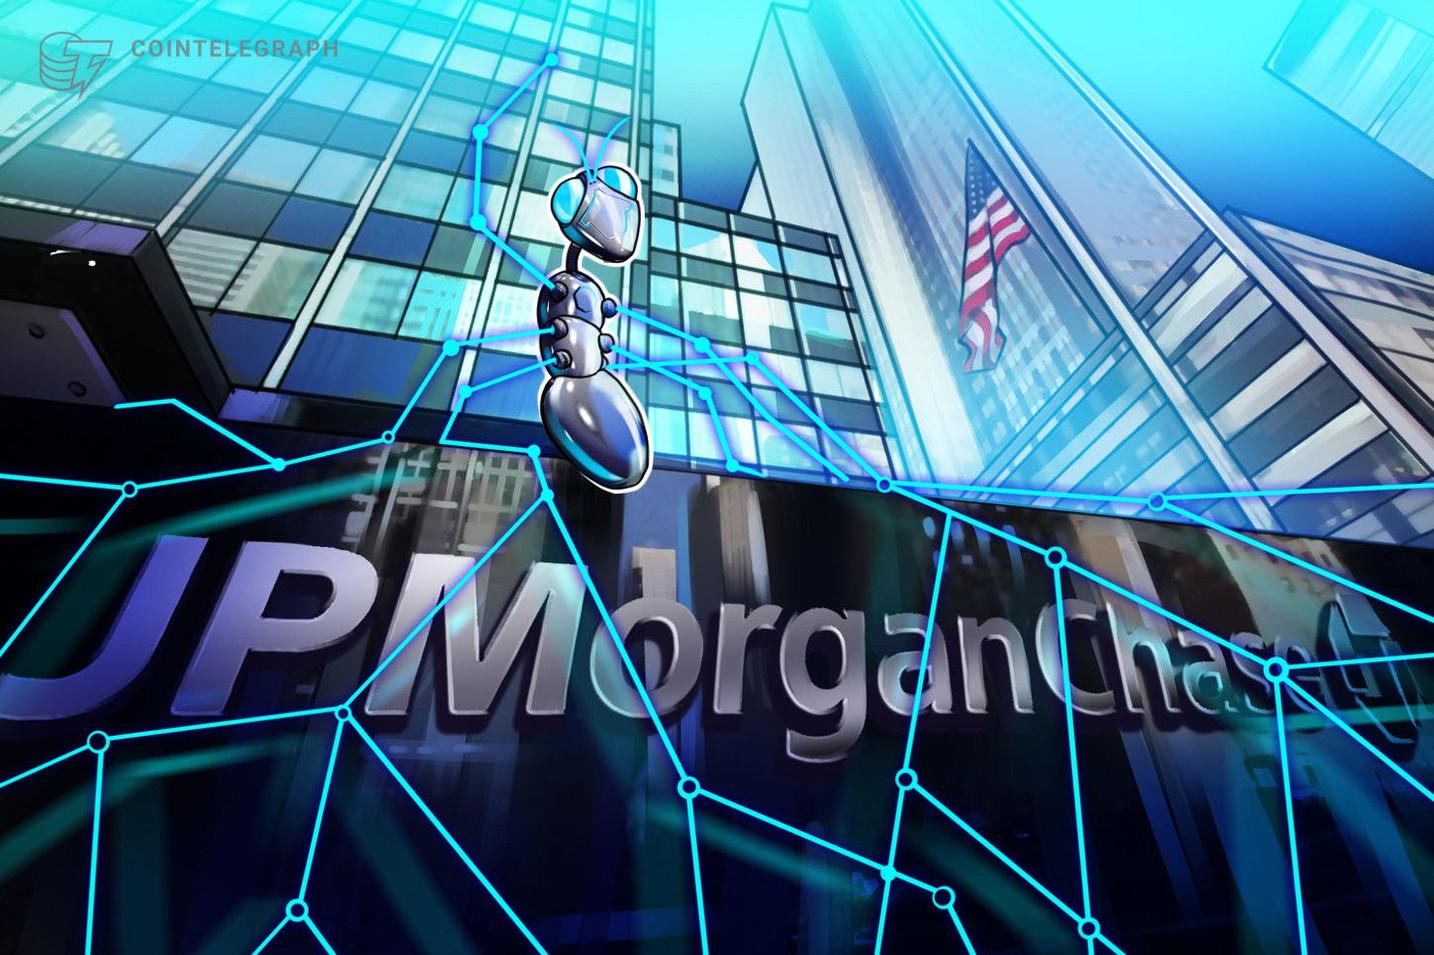 JPモルガンのブロックチェーンプラットフォーム「INN」、来年はじめにも日本で展開=ブルームバーグ【ニュース】